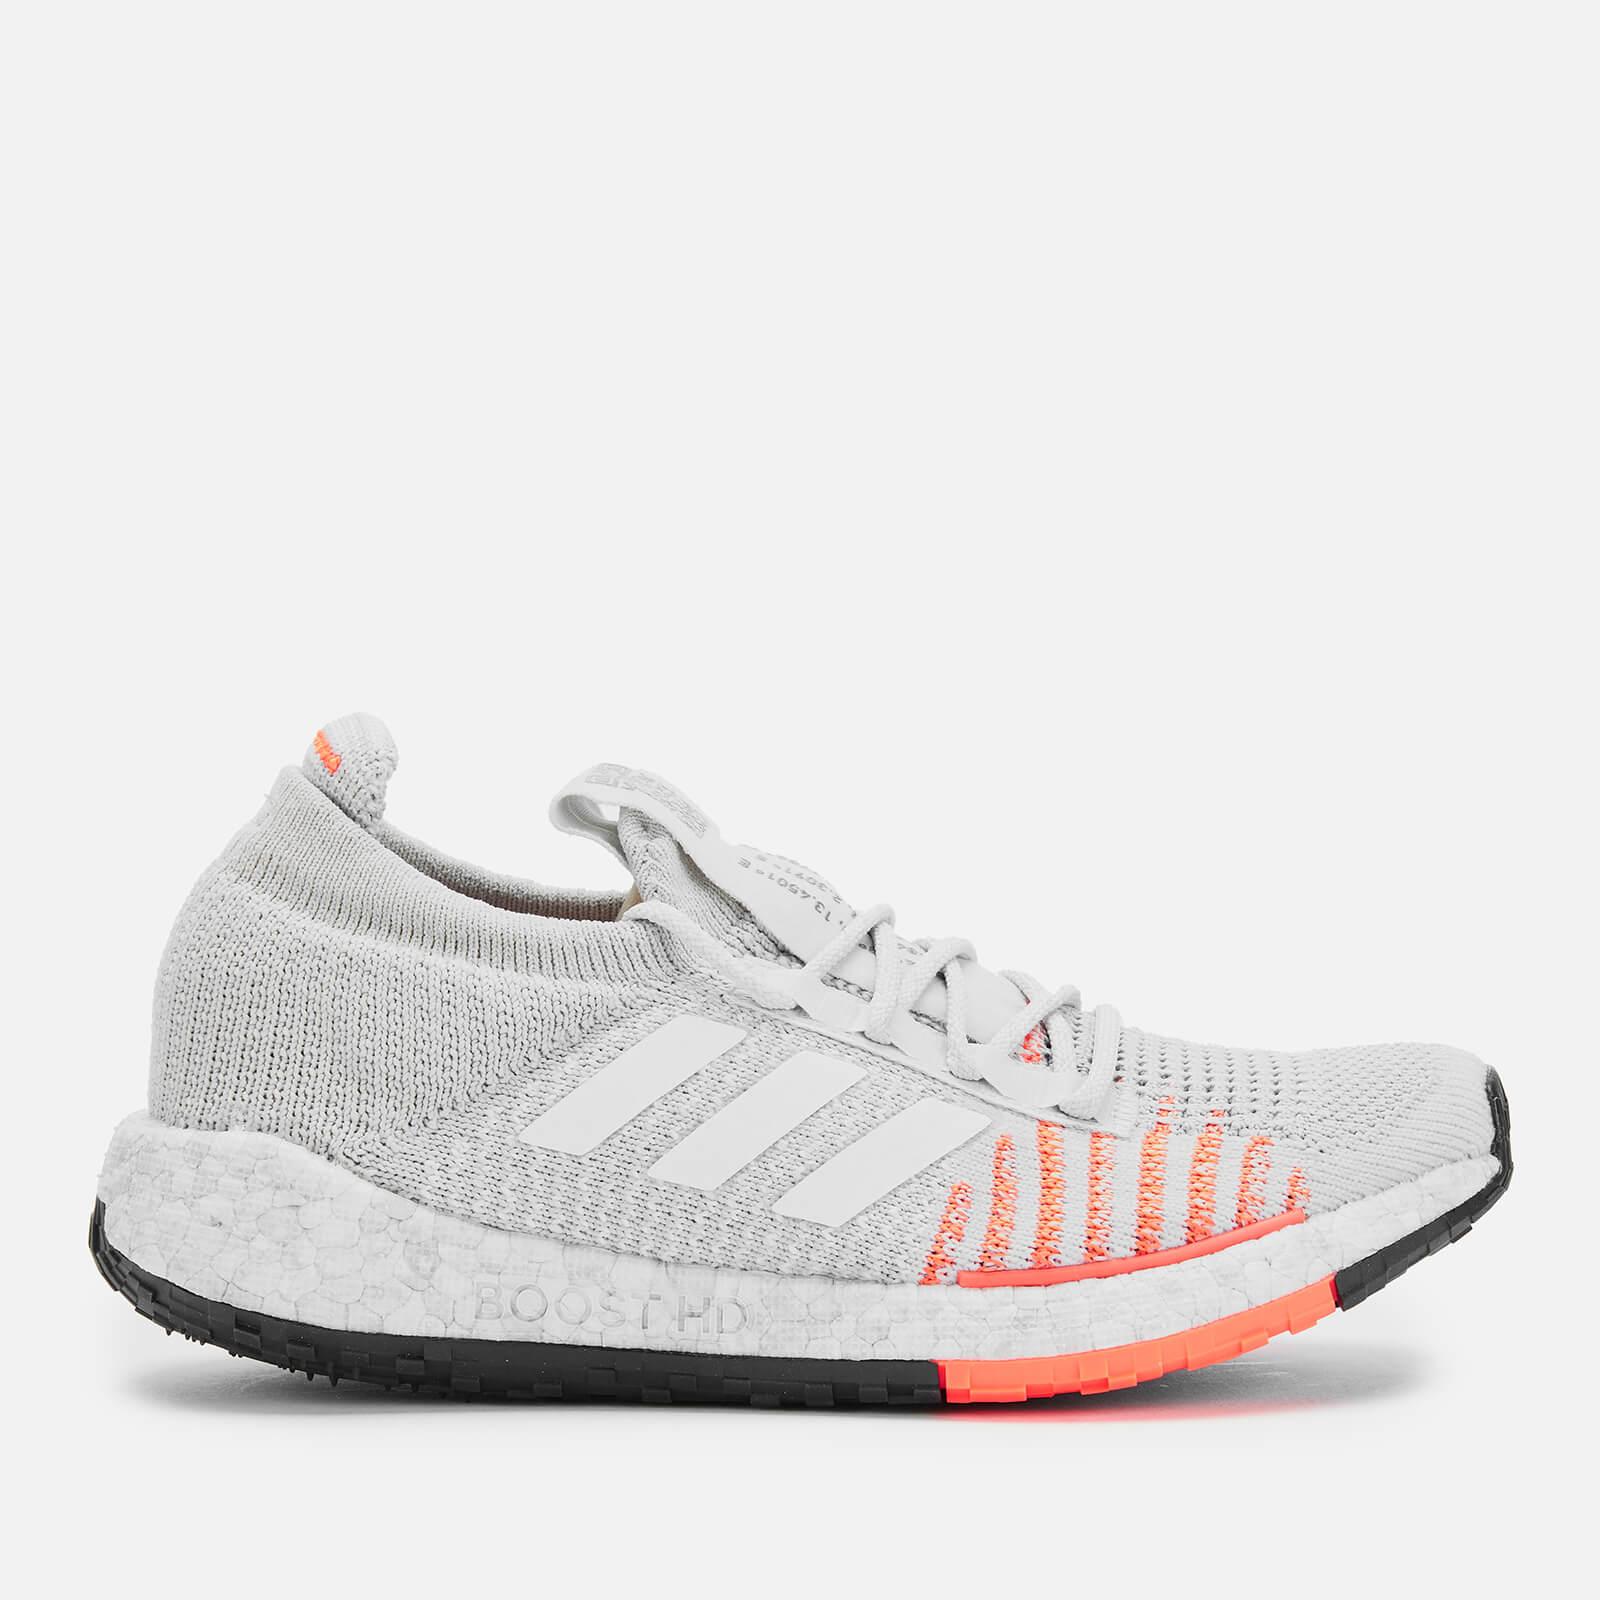 adidas Women's Pulse Boost HD Trainers - Grey/Orange - UK 6 - Grey